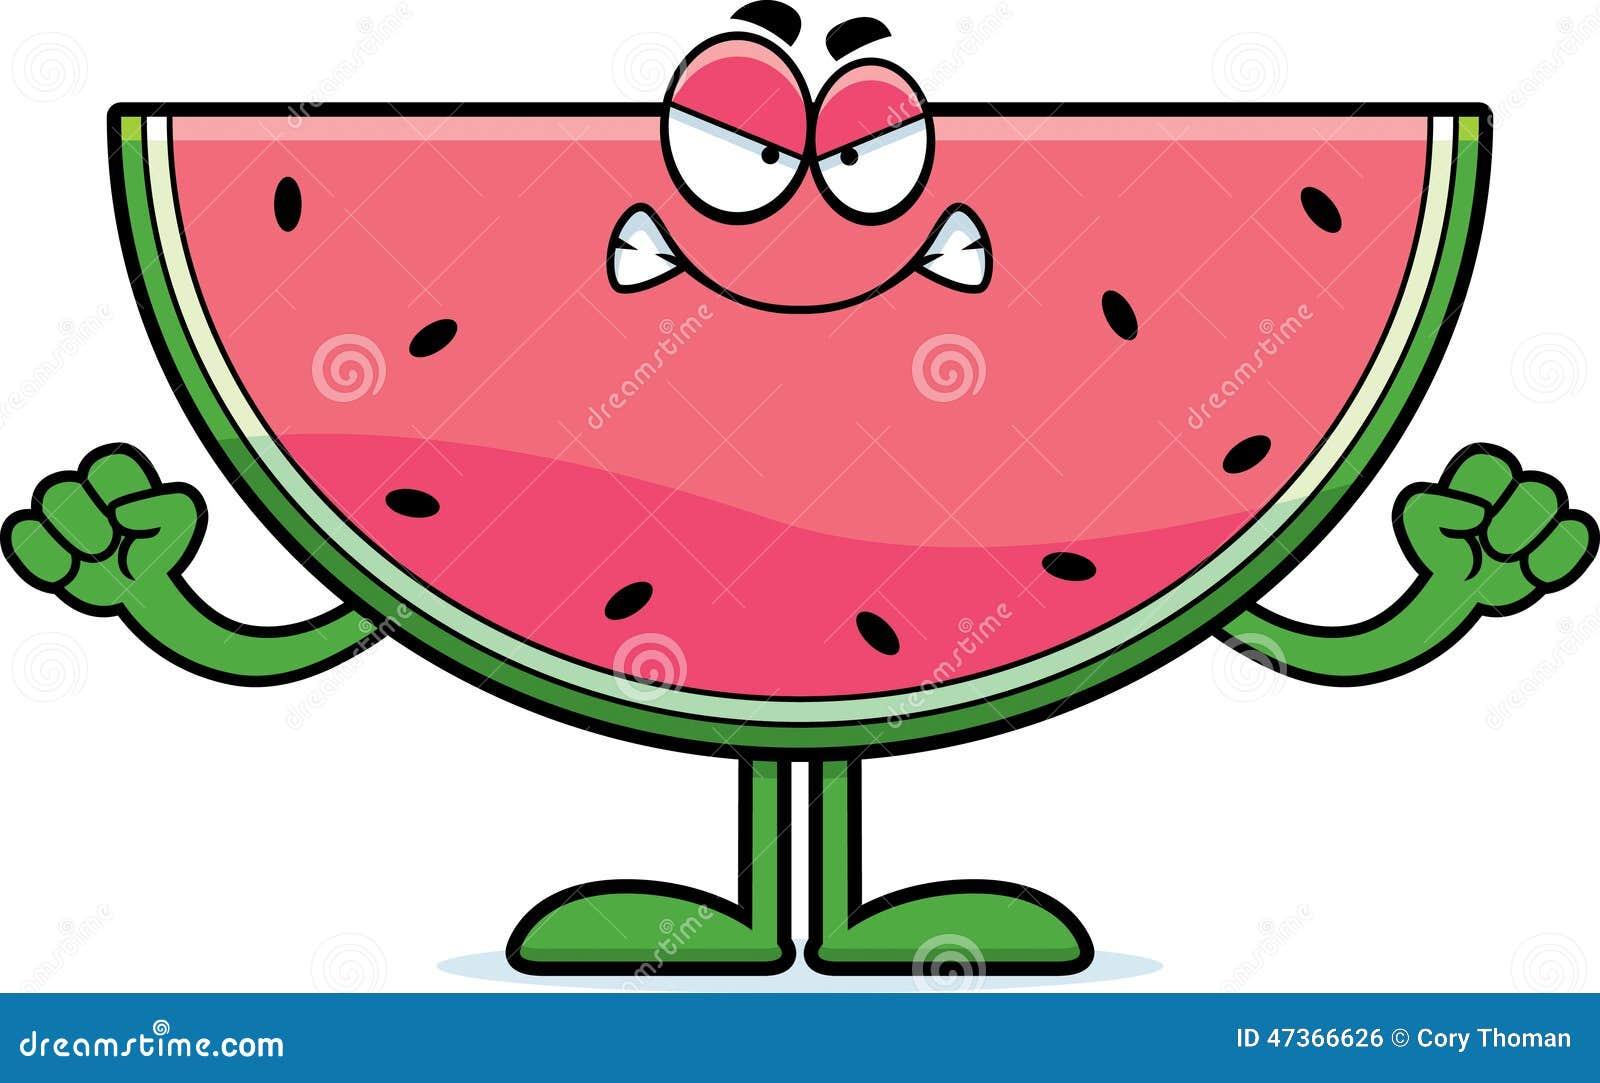 Watermelon Cartoon Images Angry Cartoon Watermelon